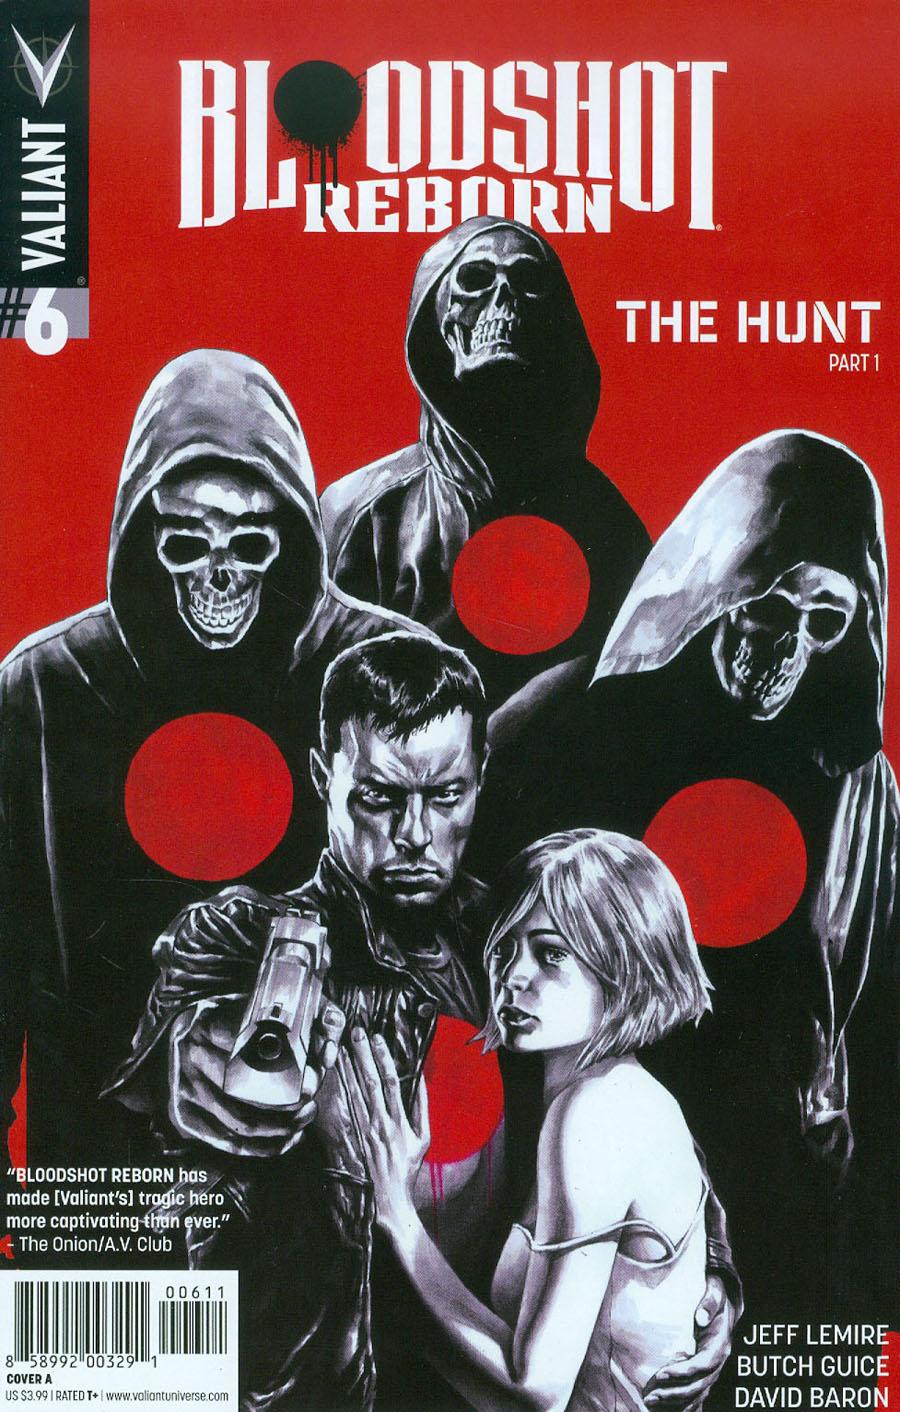 Bloodshot Reborn 6 - The Hunt Part 1